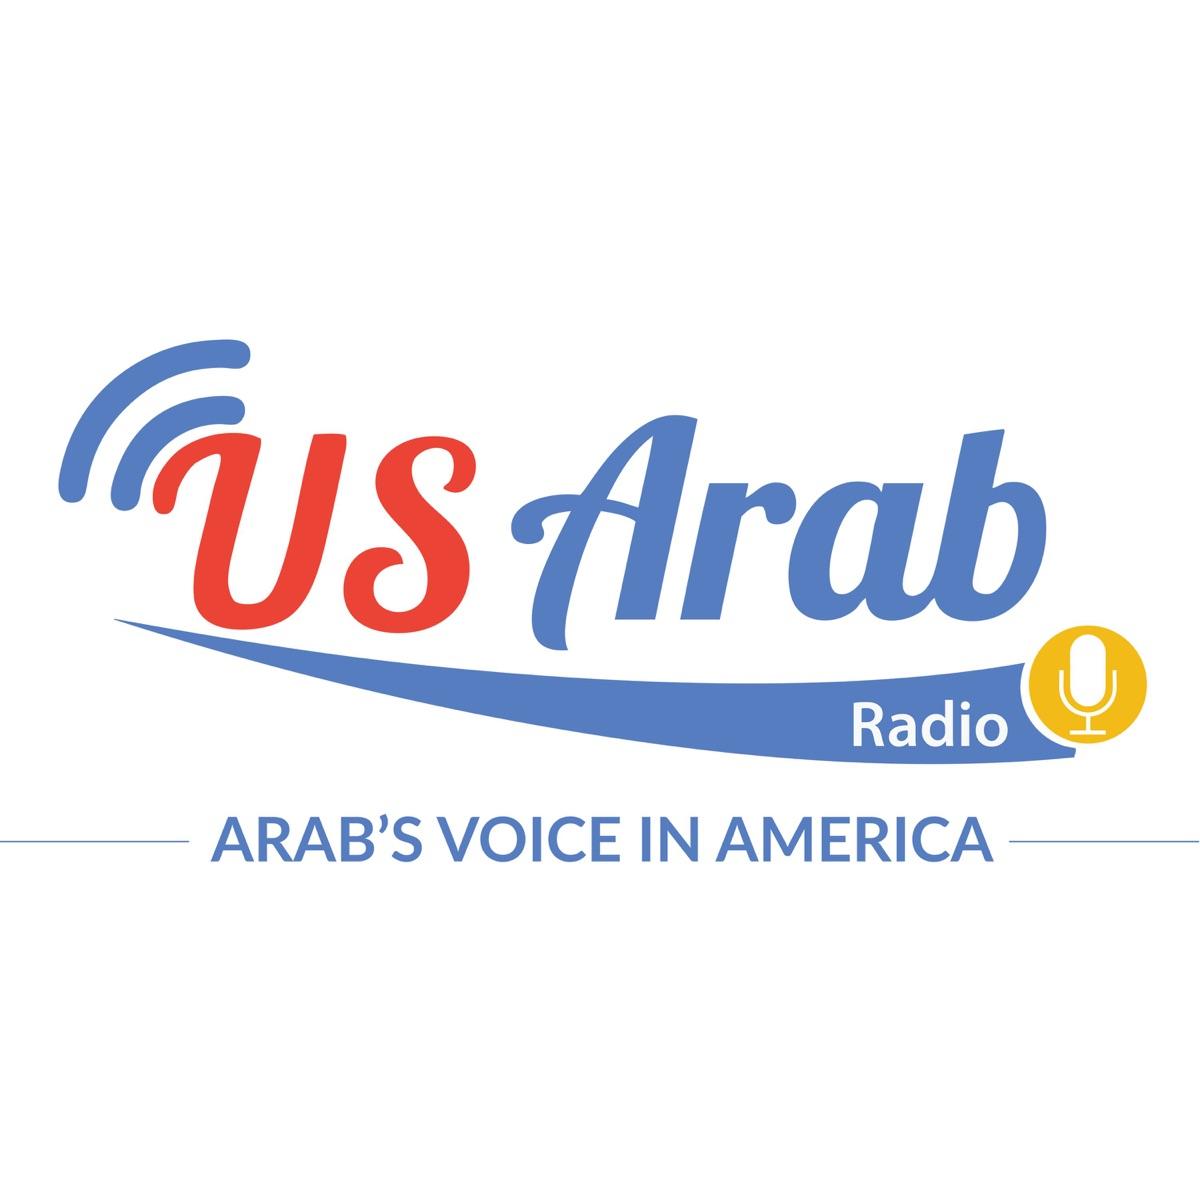 USArabRadio